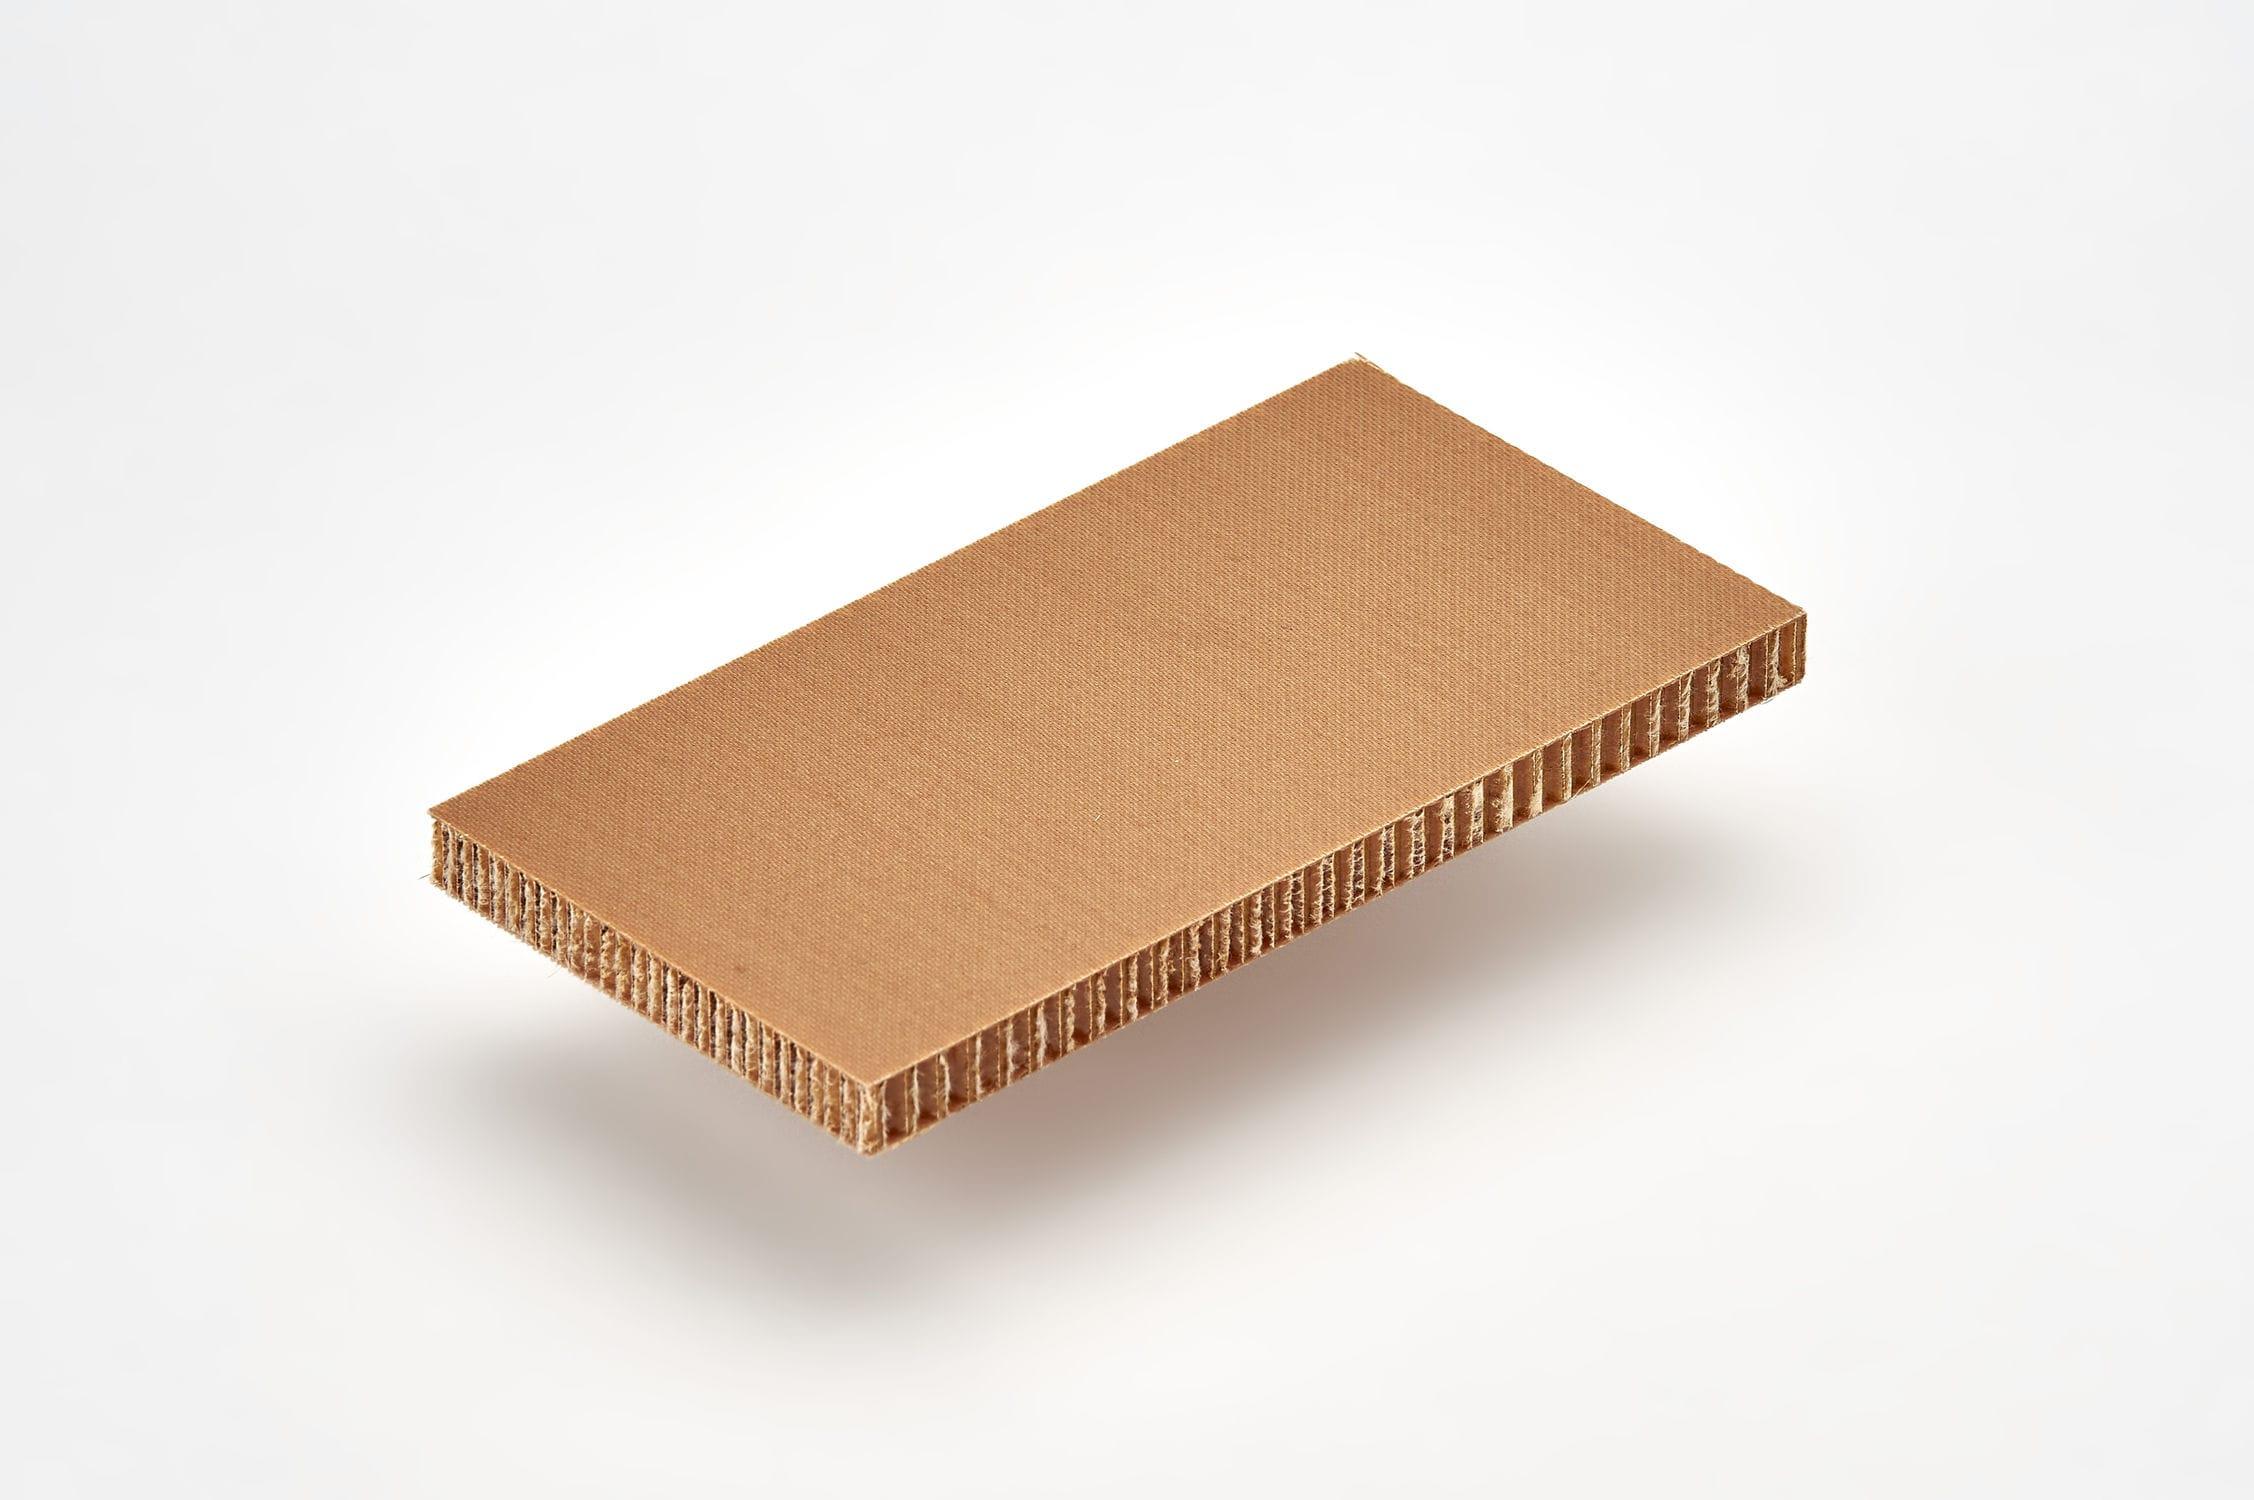 seat sandwich panel / fiberglass facing / aramid paper honeycomb core / for doors ... & Seat sandwich panel / fiberglass facing / aramid paper honeycomb ...